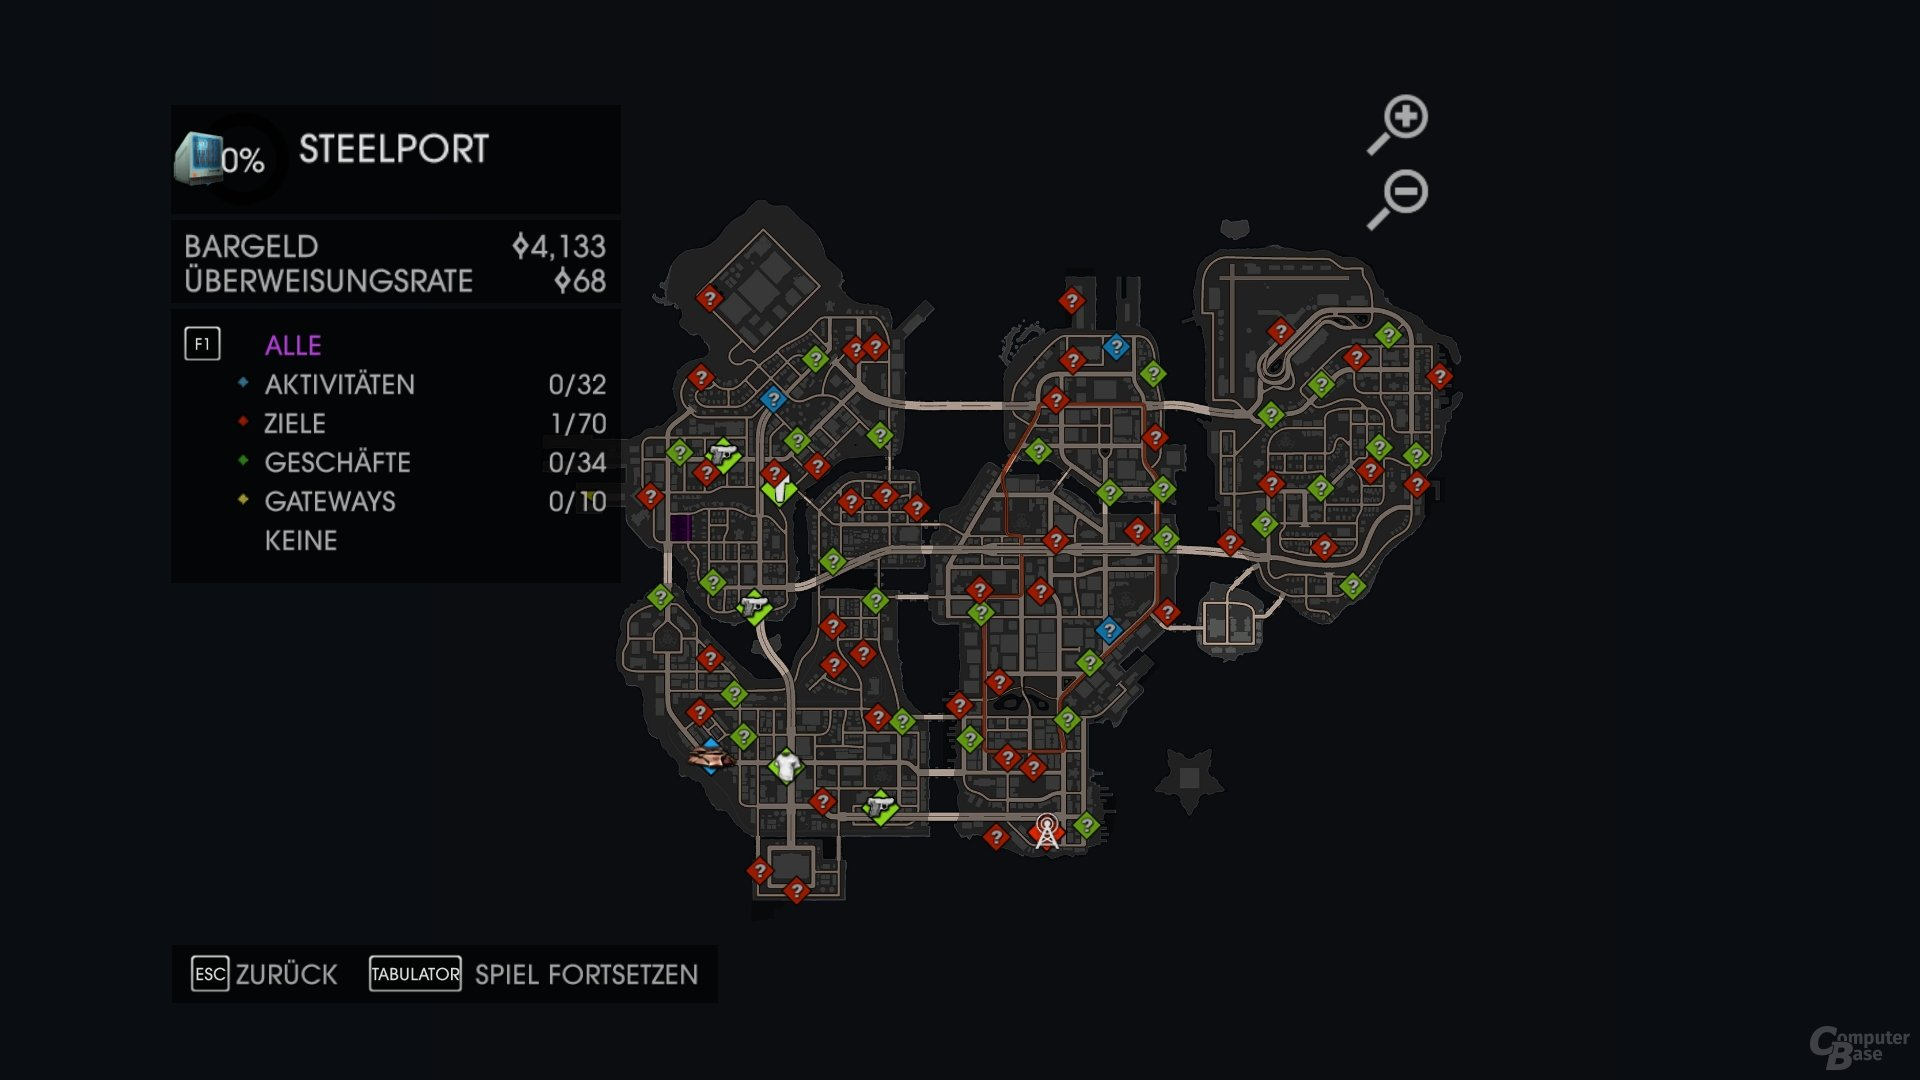 Bilder - Saints Row IV im Test: Abgedrehter Matrix-Klon - ComputerBase